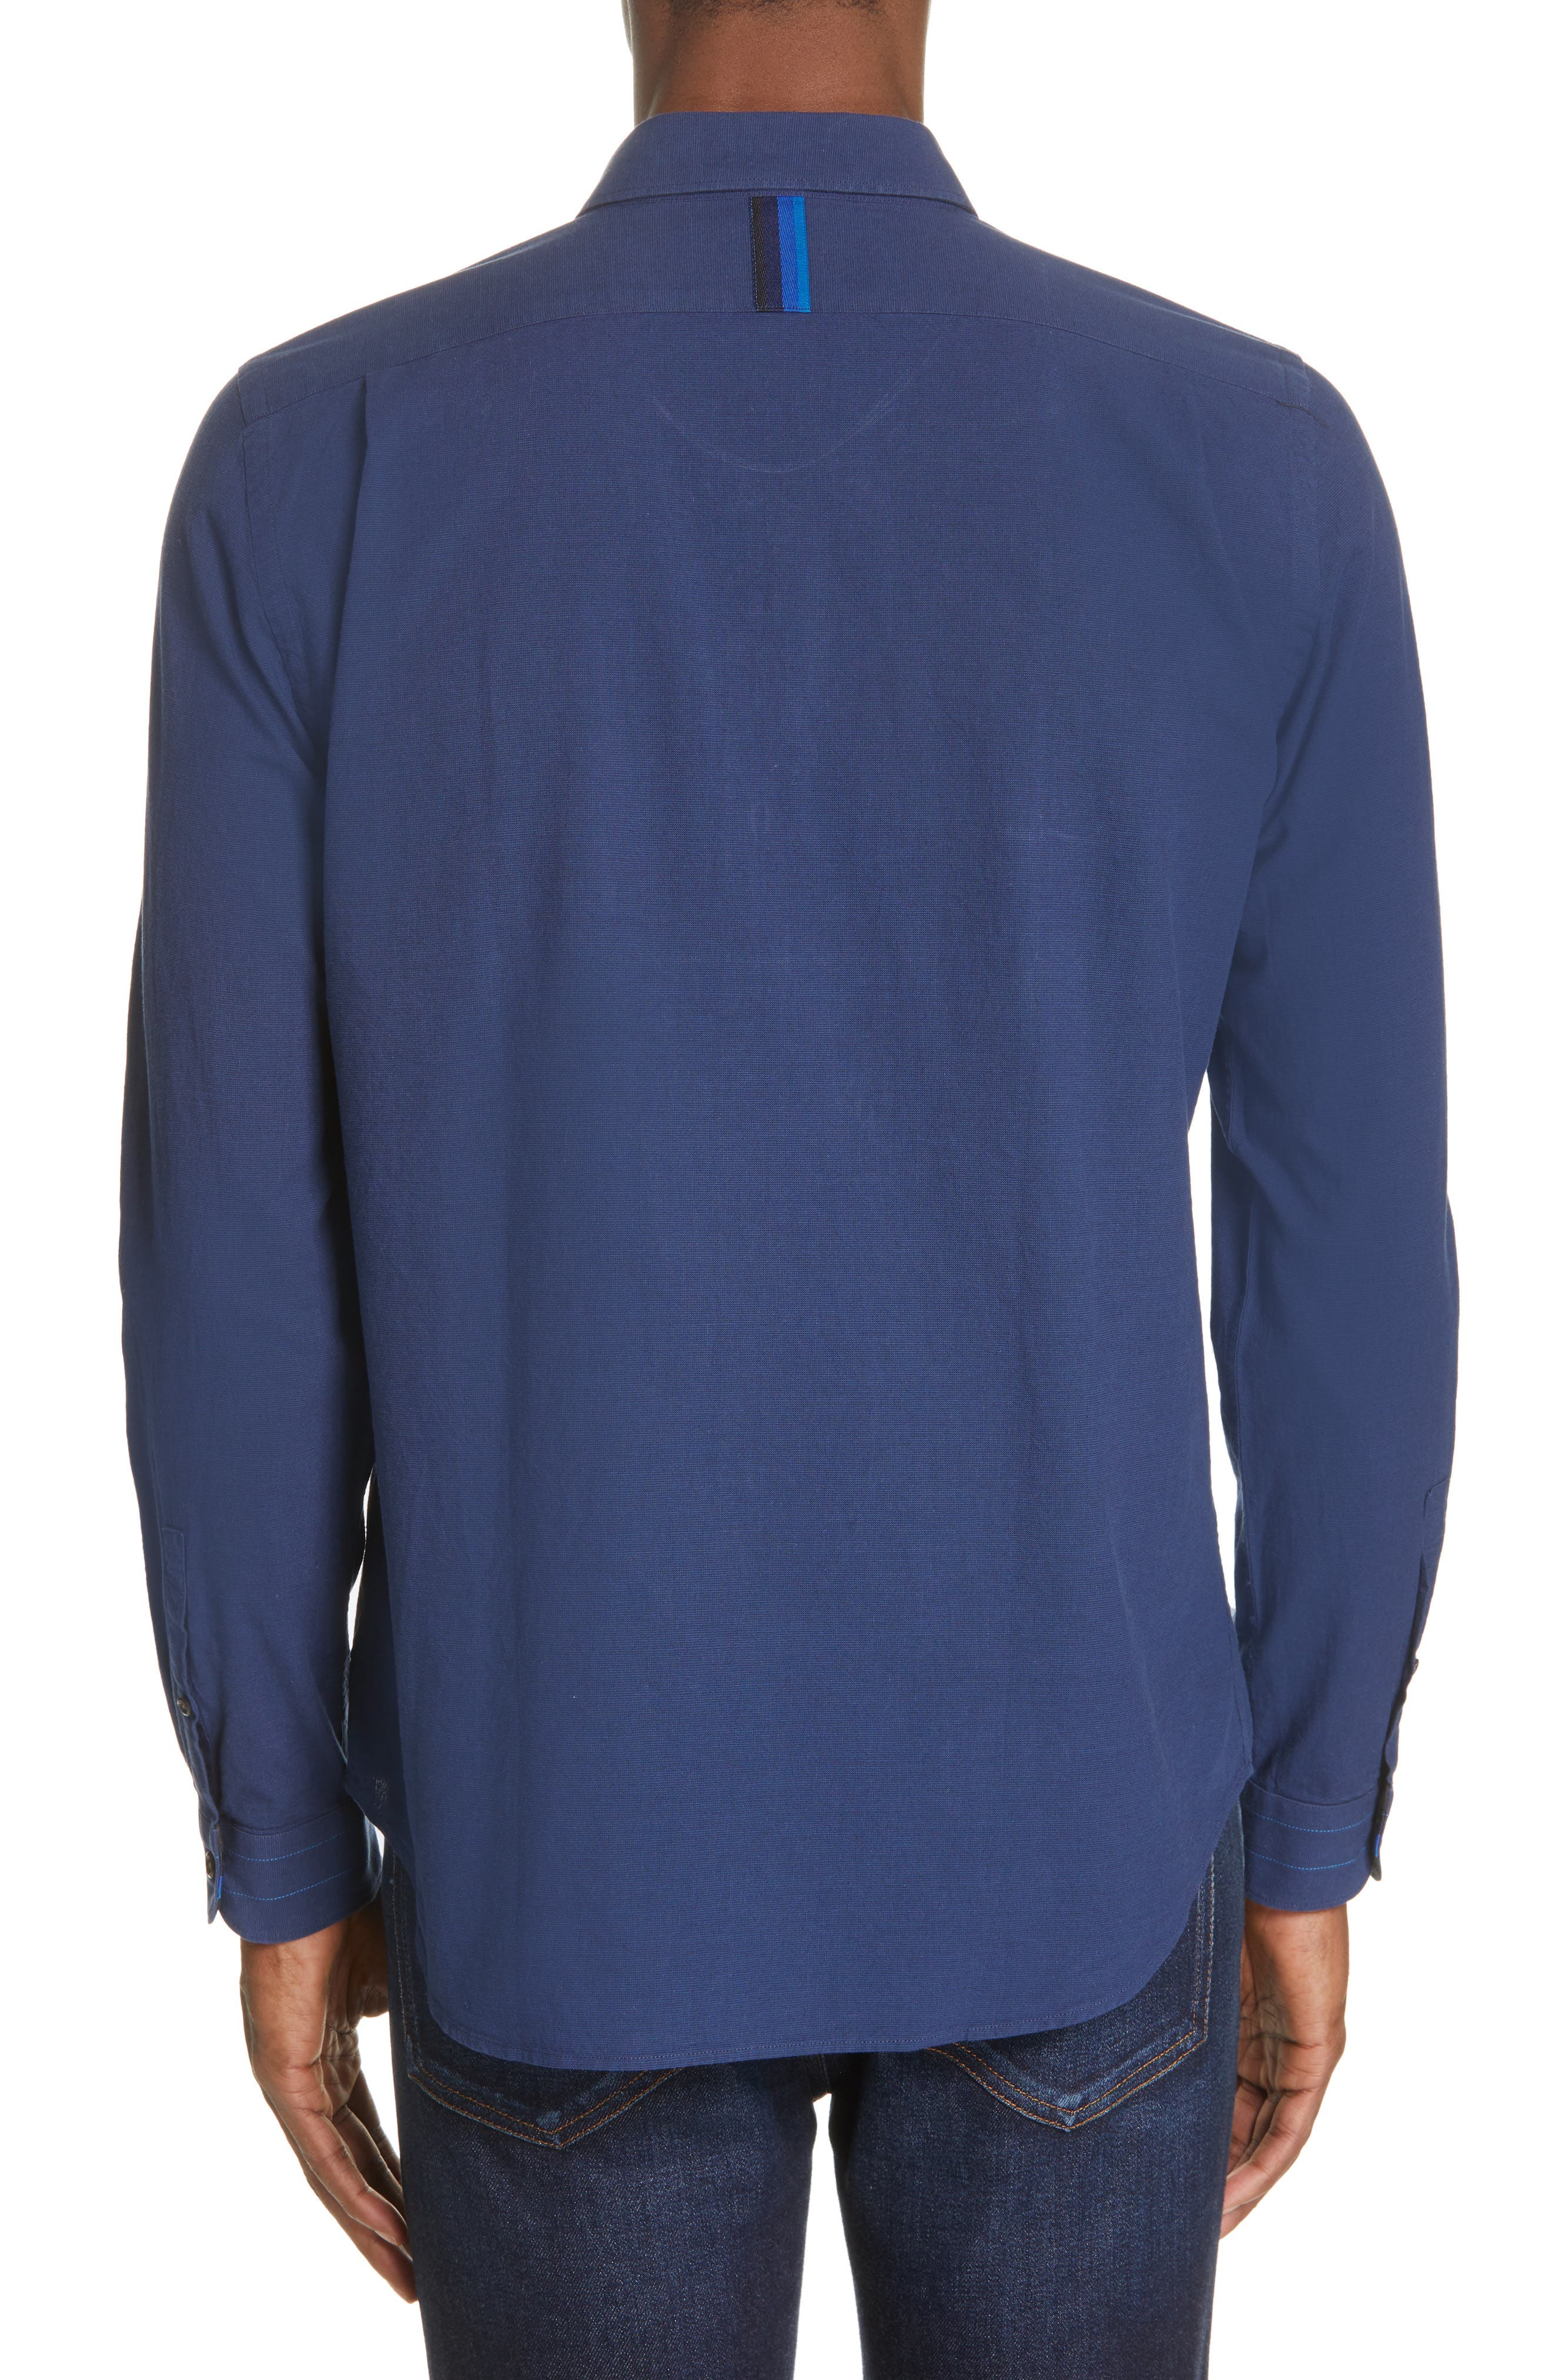 PS PAUL SMITH, Contrast Sport Shirt, Alternate thumbnail 3, color, BLUE